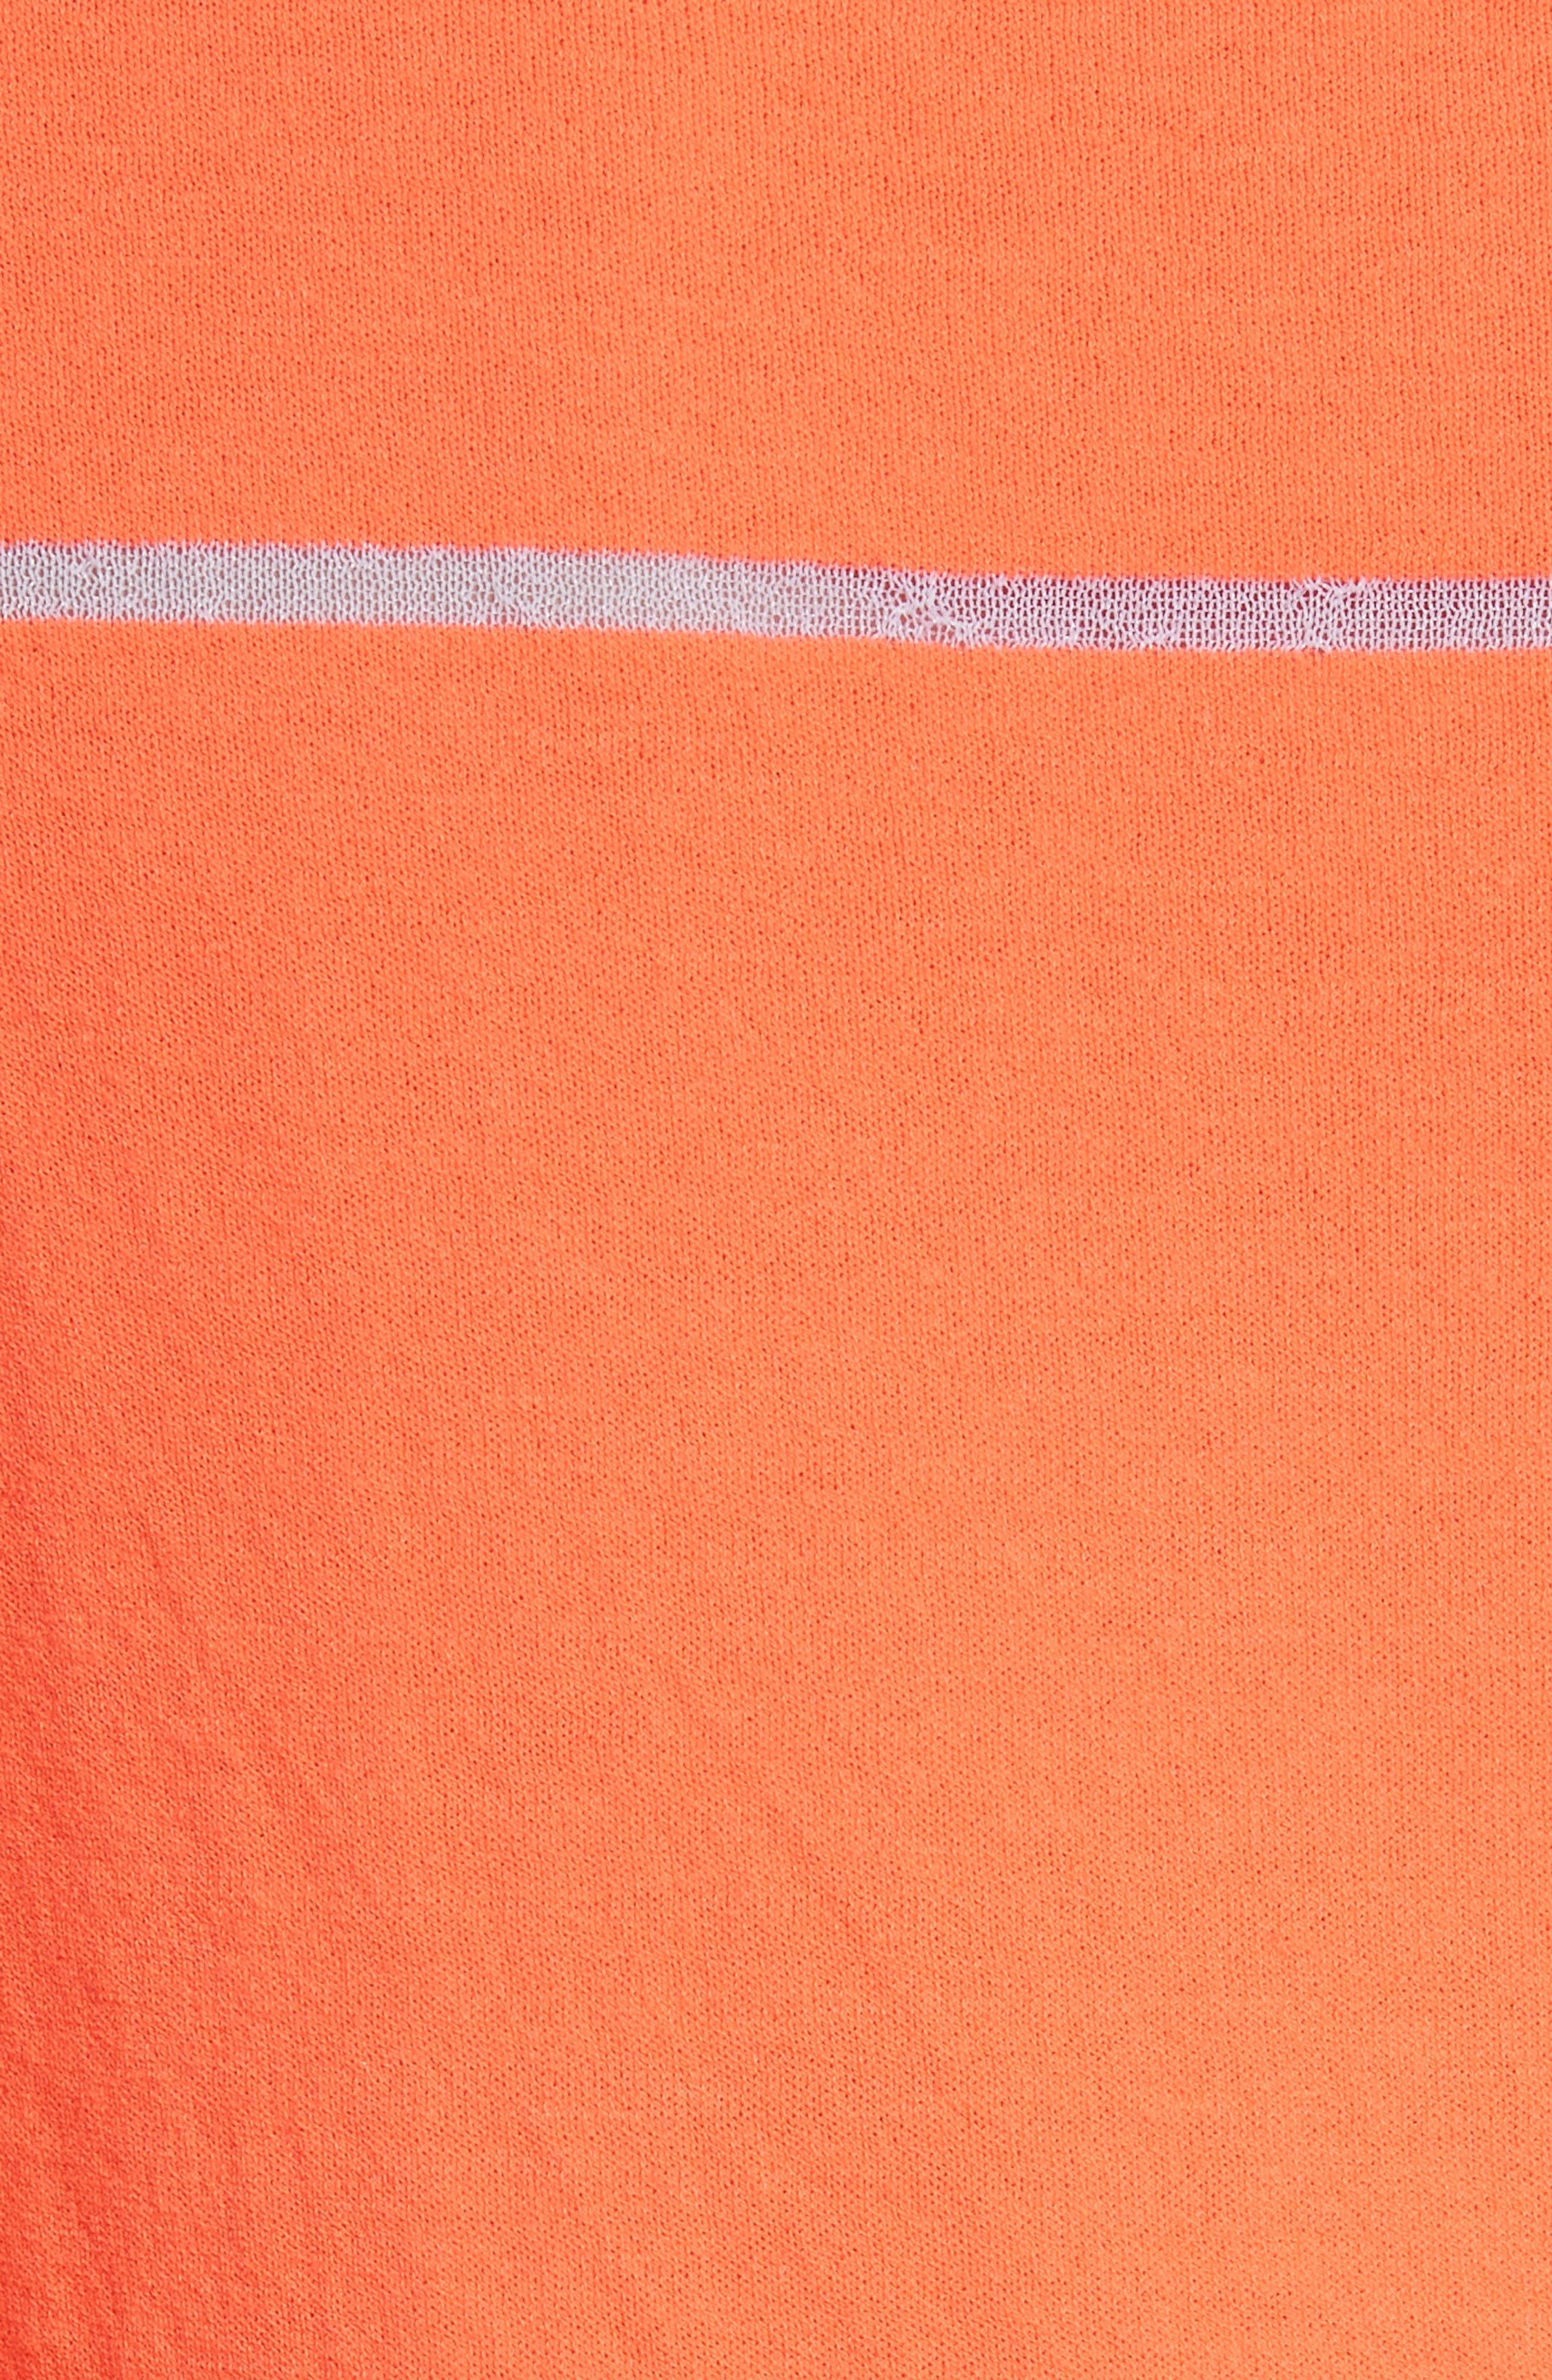 Illusion Stripe Crewneck Sweater,                             Alternate thumbnail 5, color,                             850